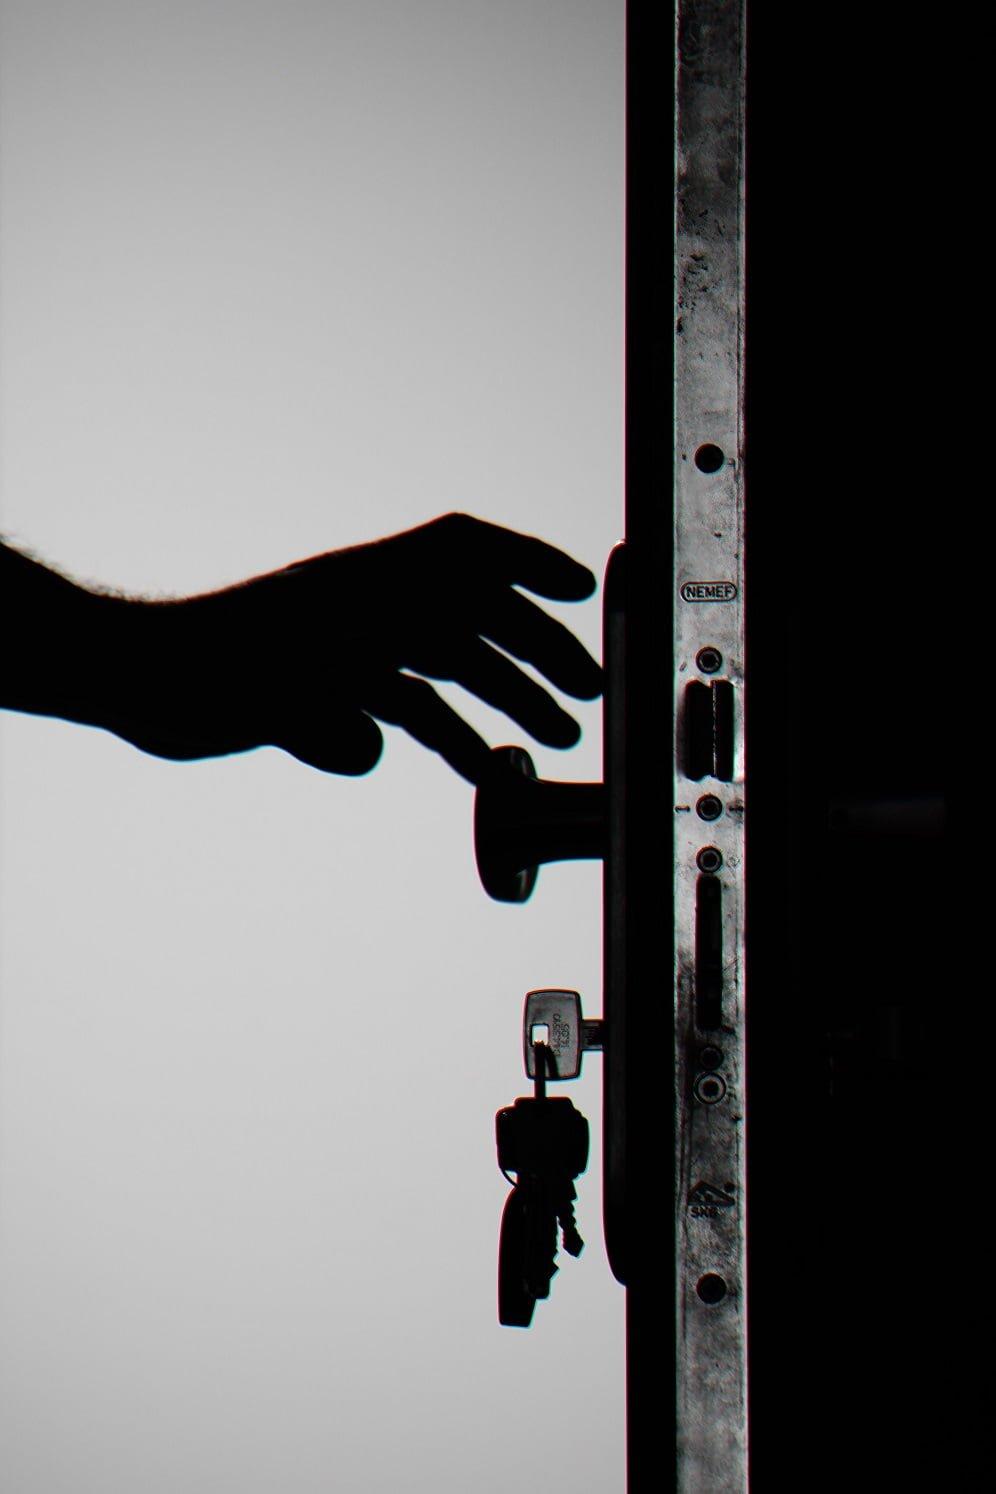 ciberseguridad puerta